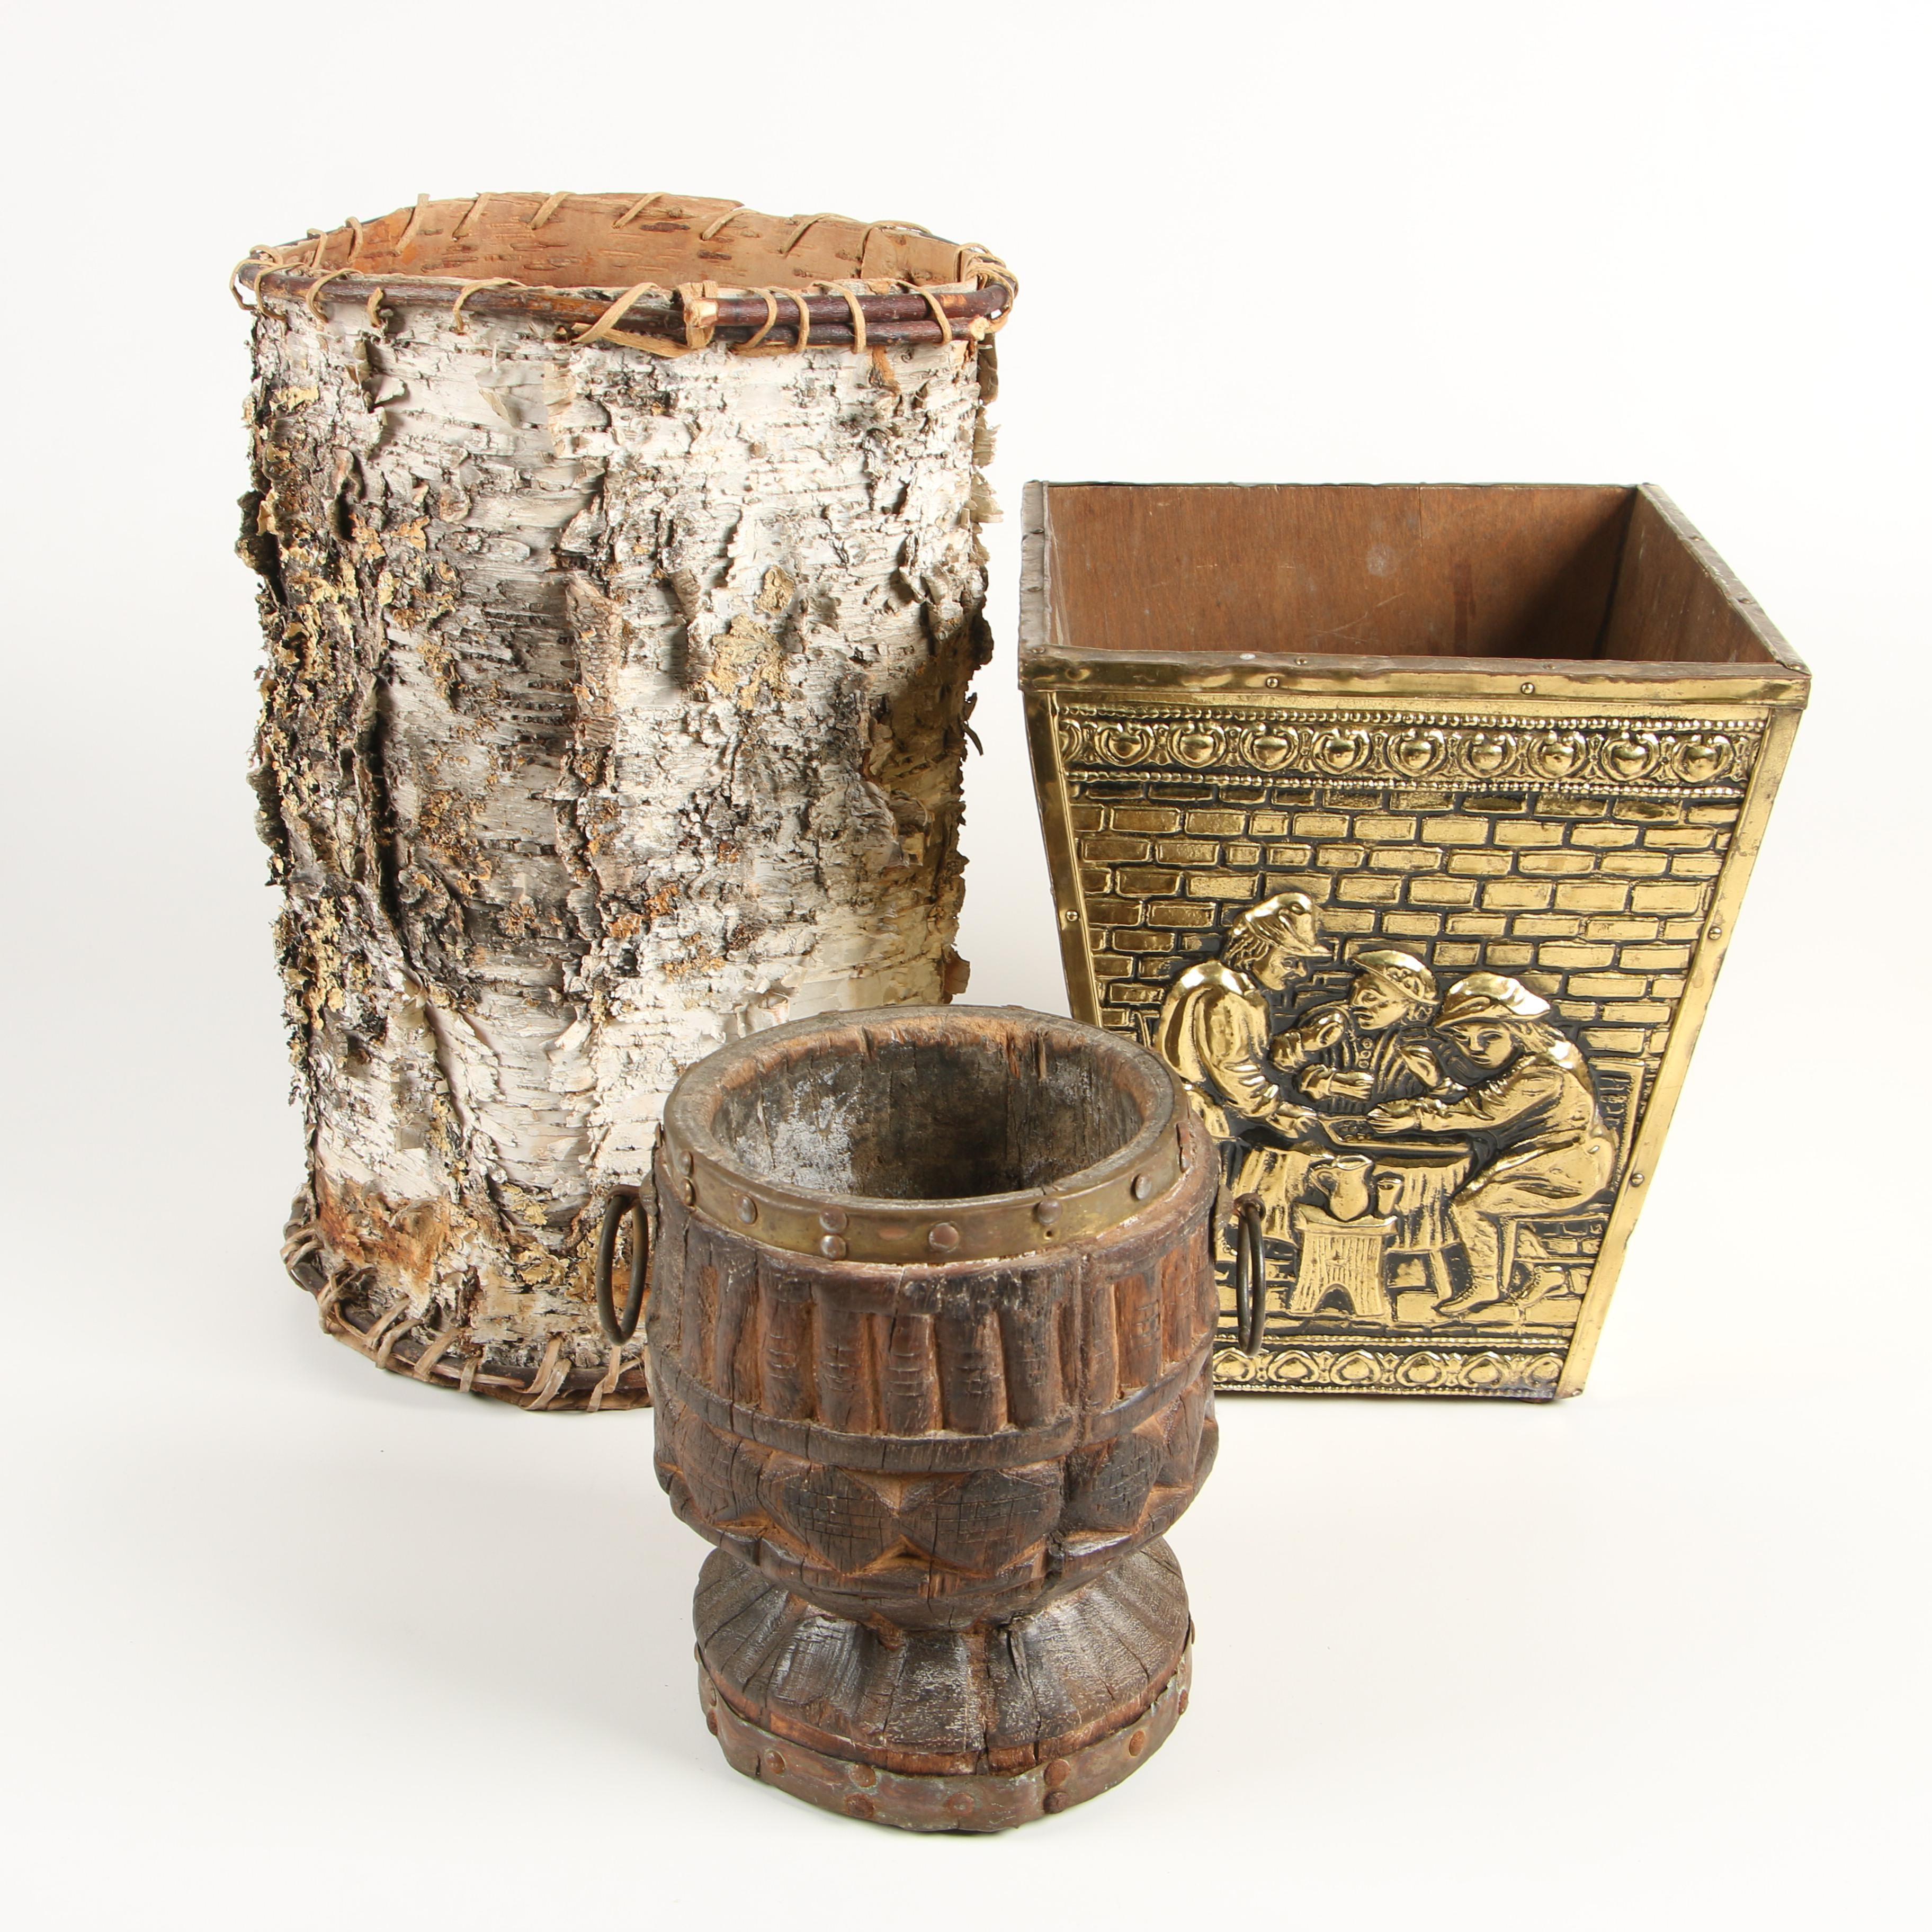 Birch Bark Basket, Embossed Brass Wastebasket, and Hewn Wood Cache Pot